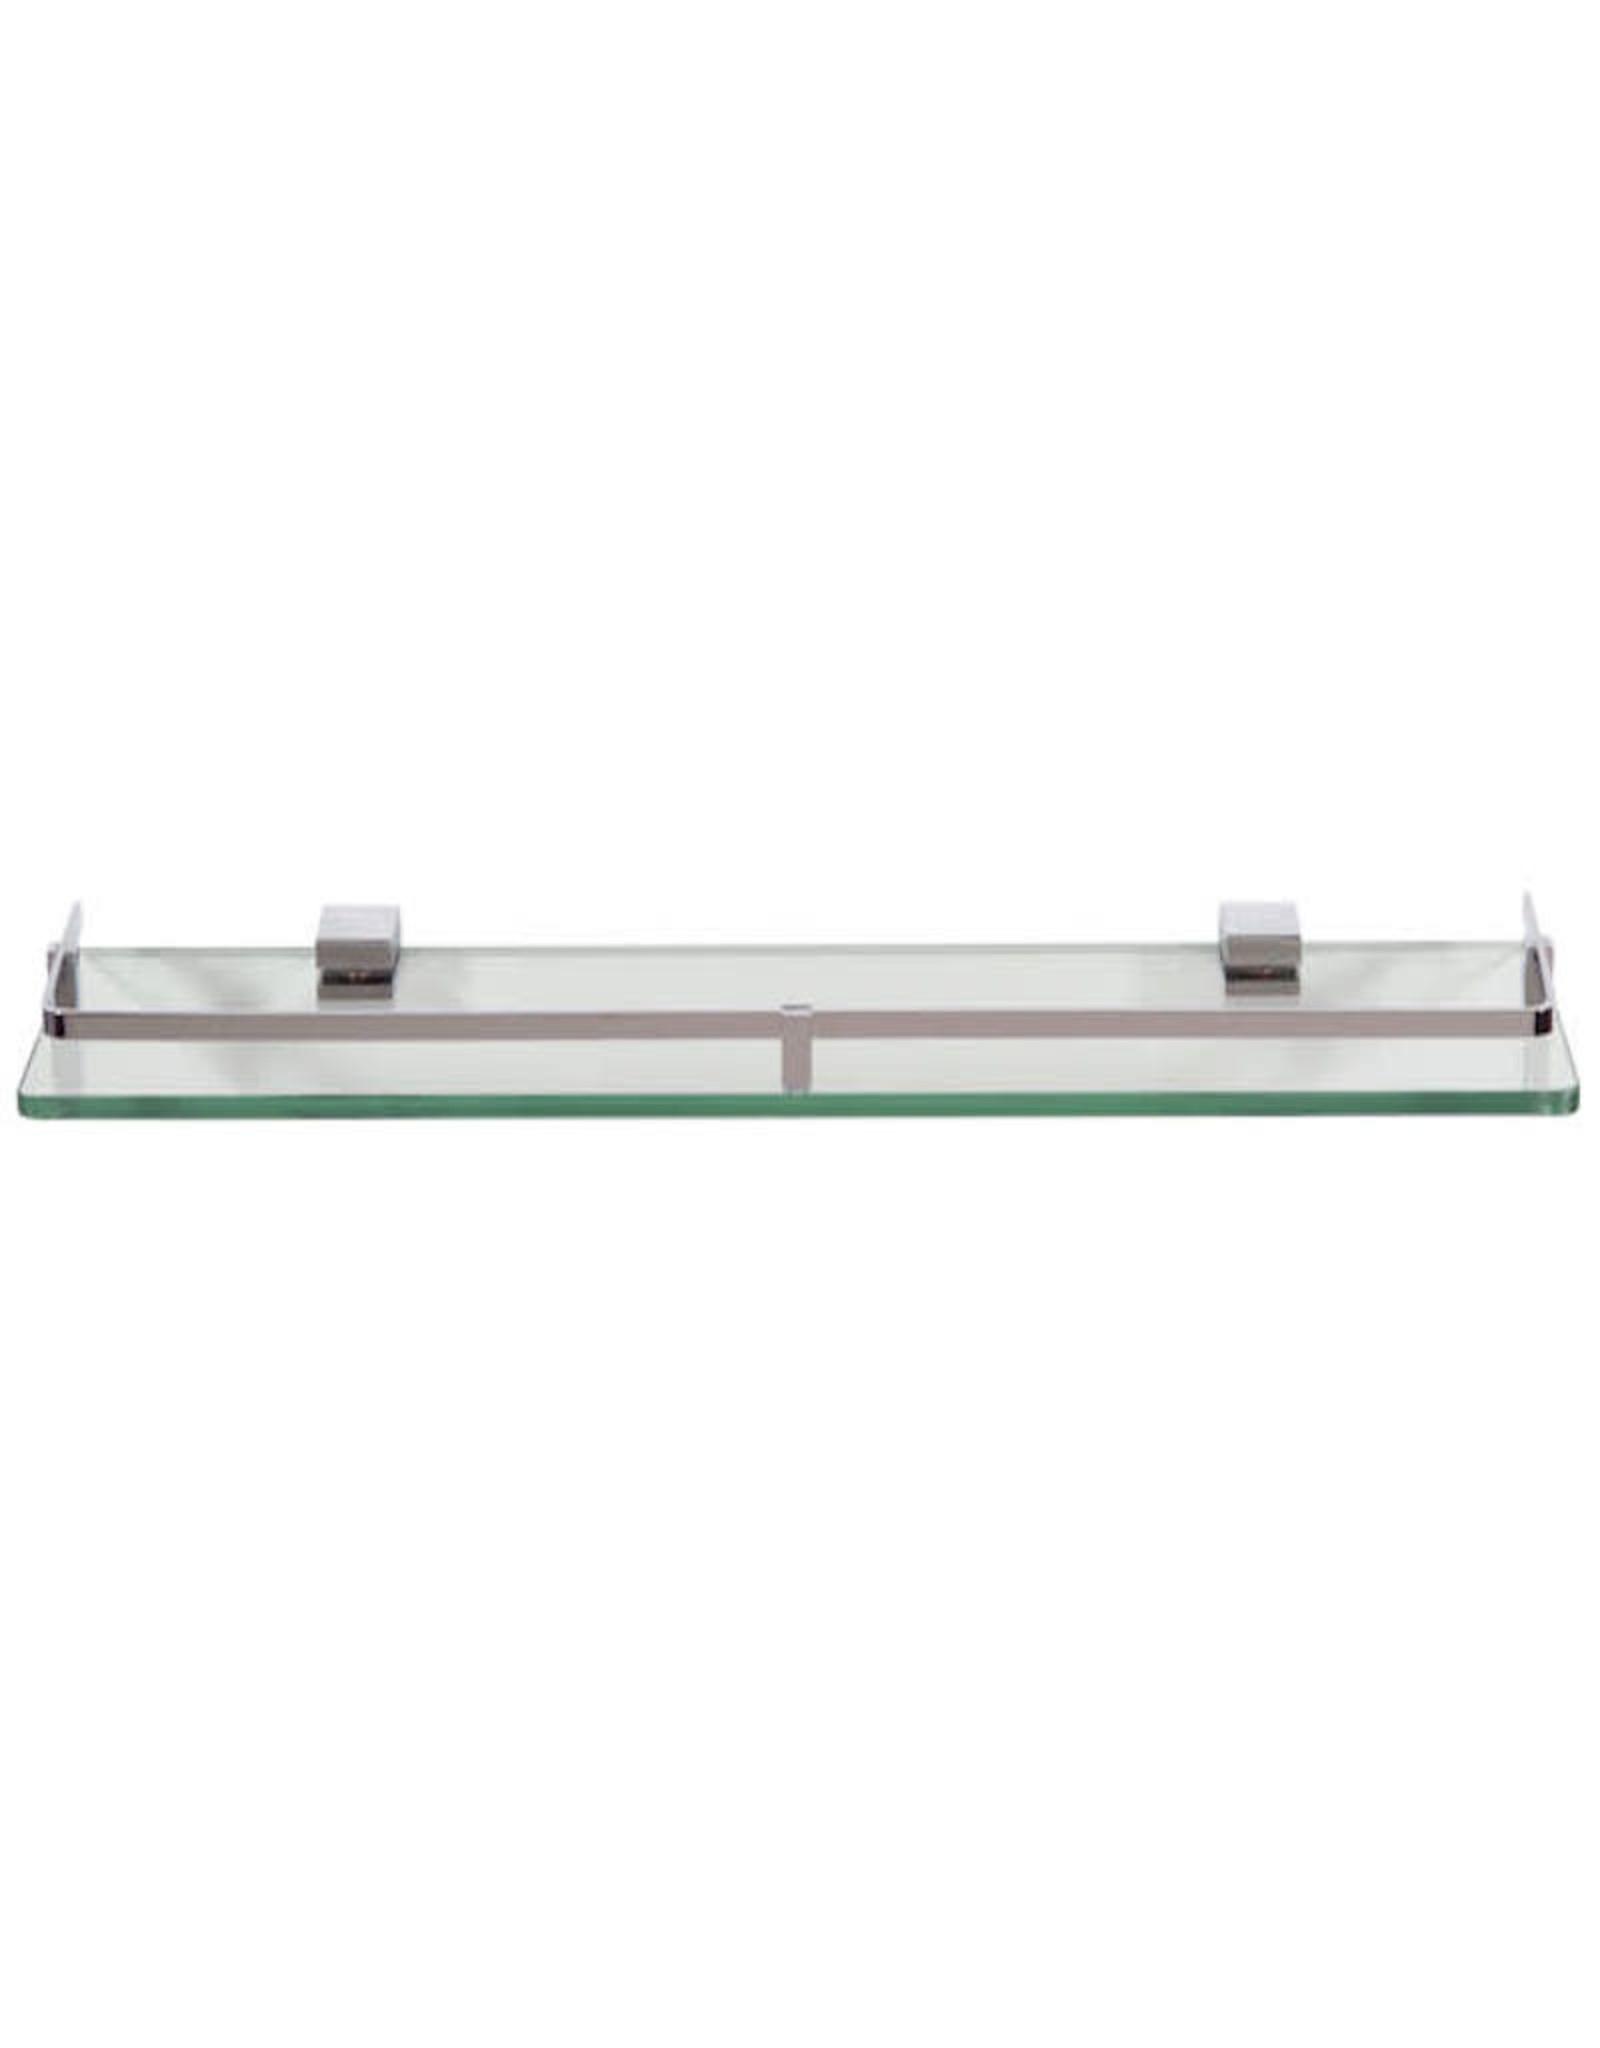 LalOO Laloo Karre II Single Glass Shelf